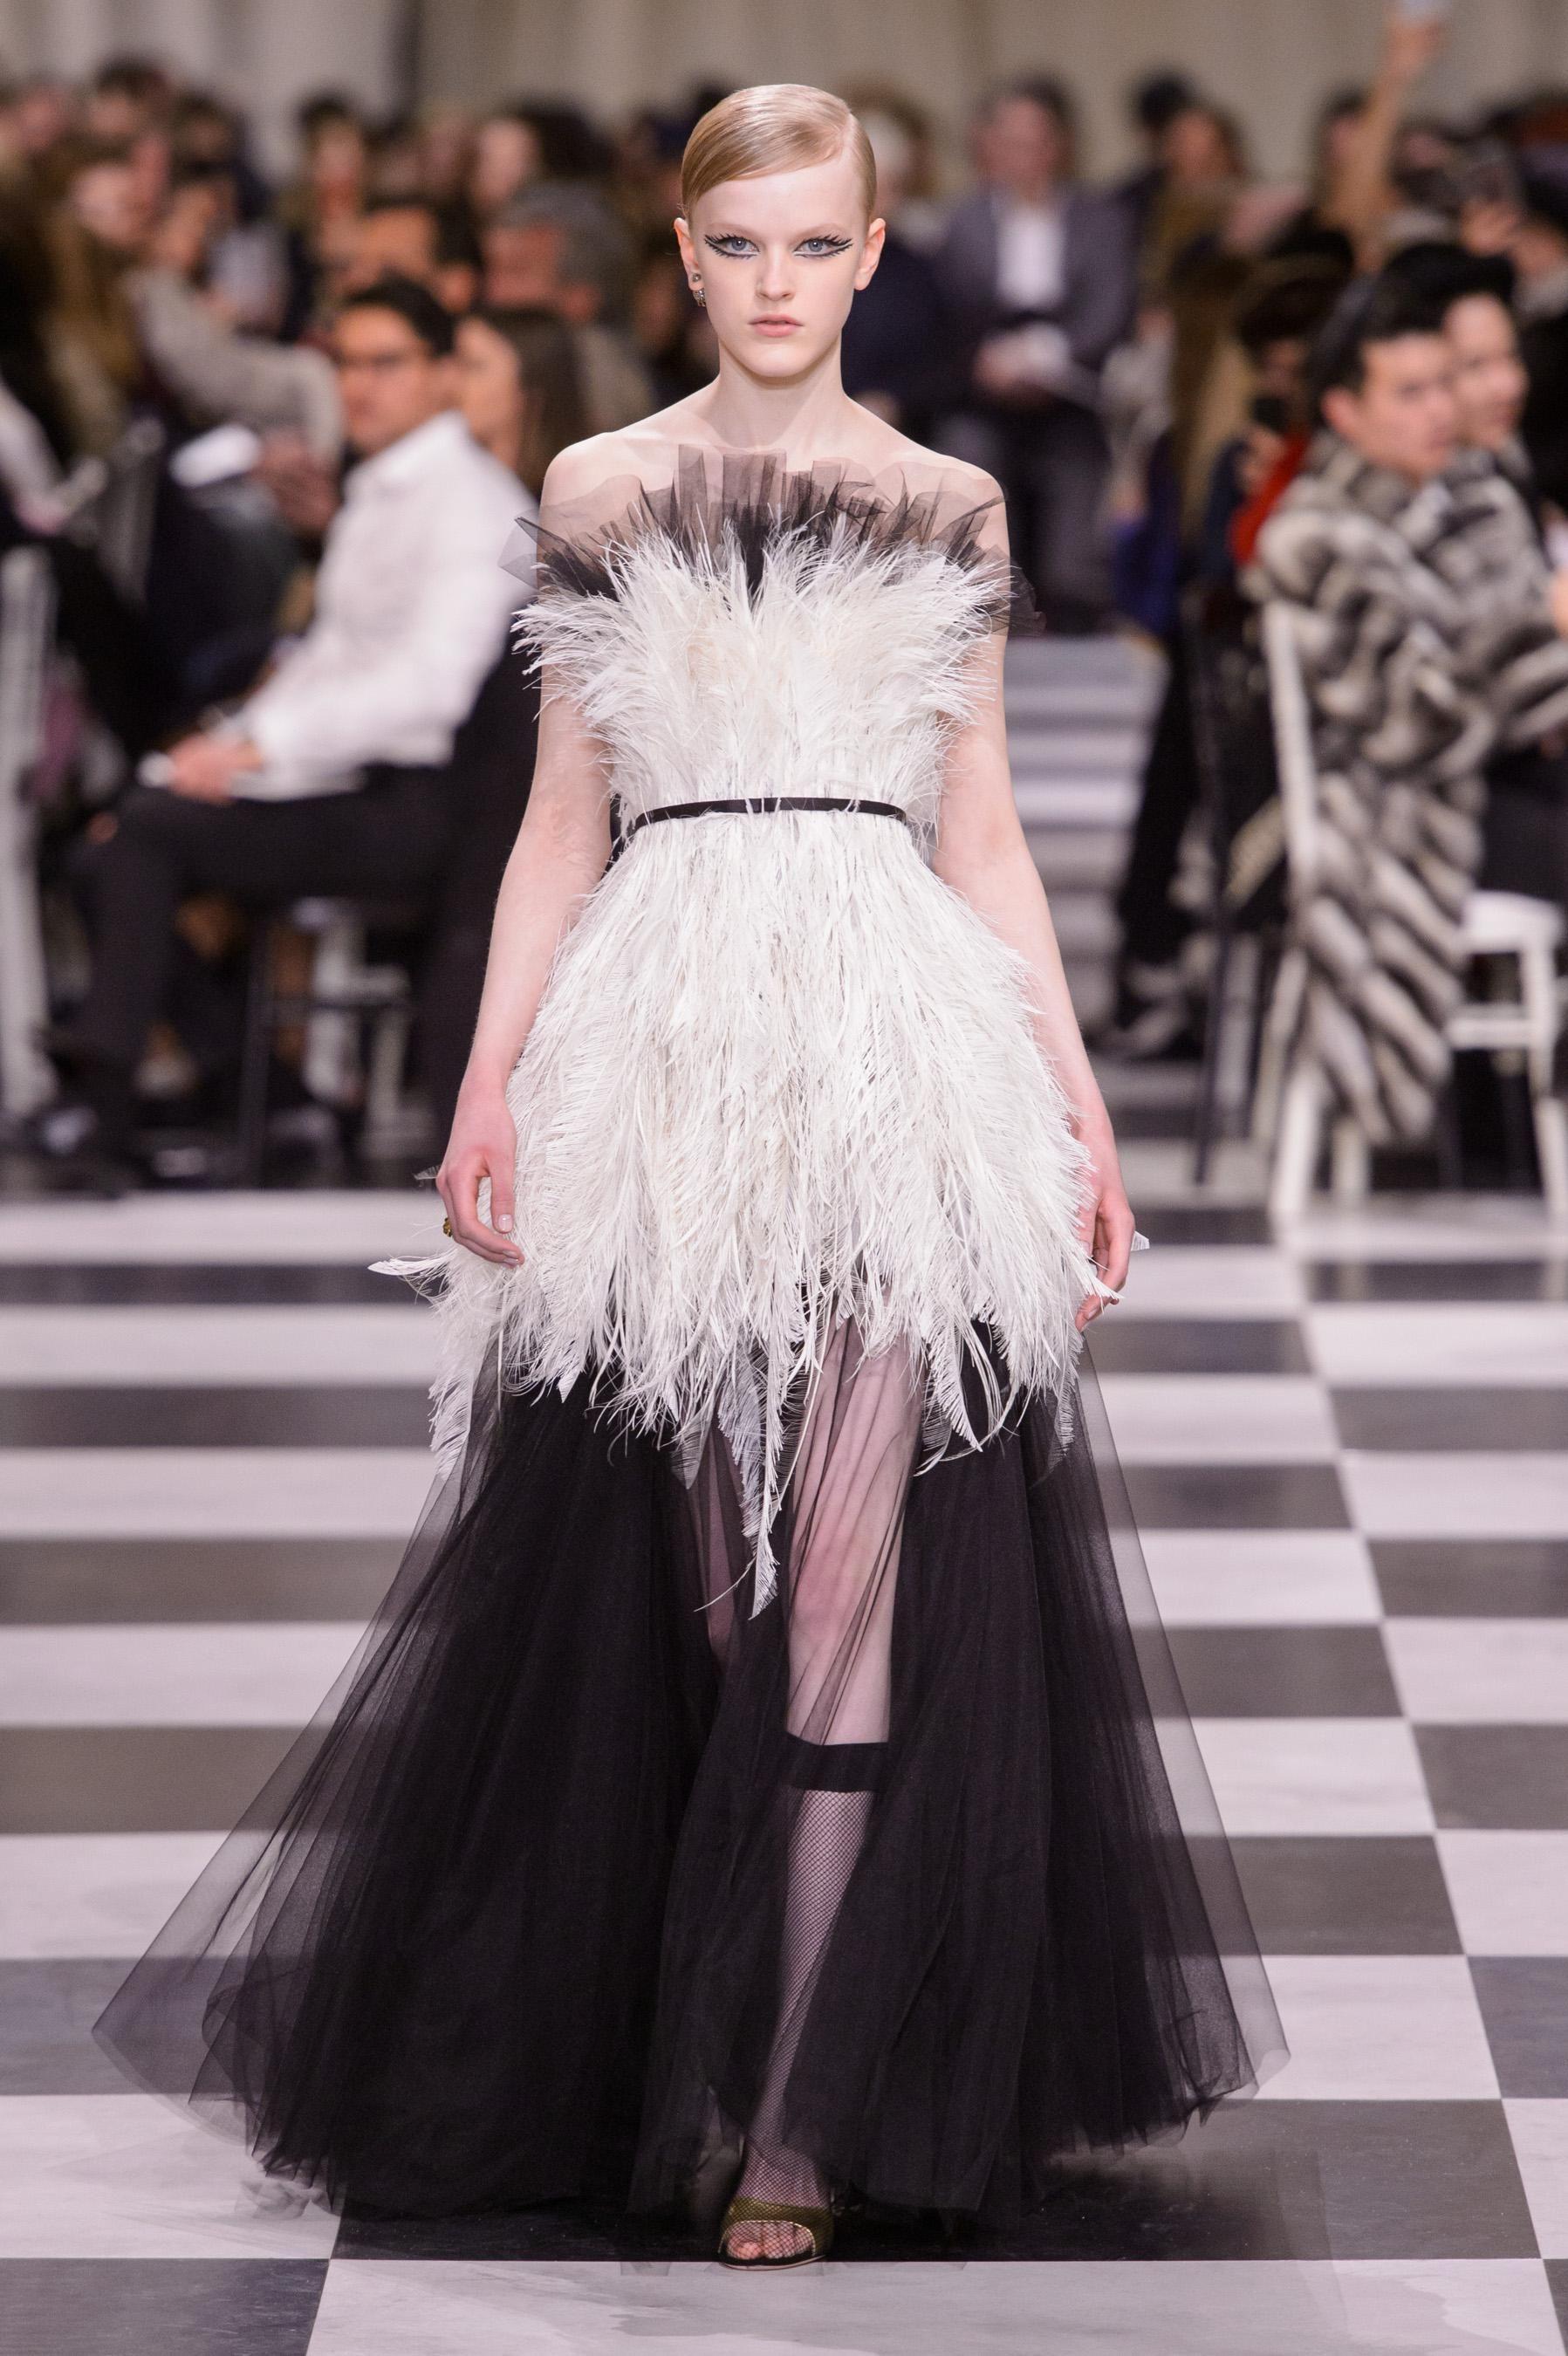 603c90eaf05 Défilé Christian Dior Printemps-été 2018 Haute couture - Madame Figaro